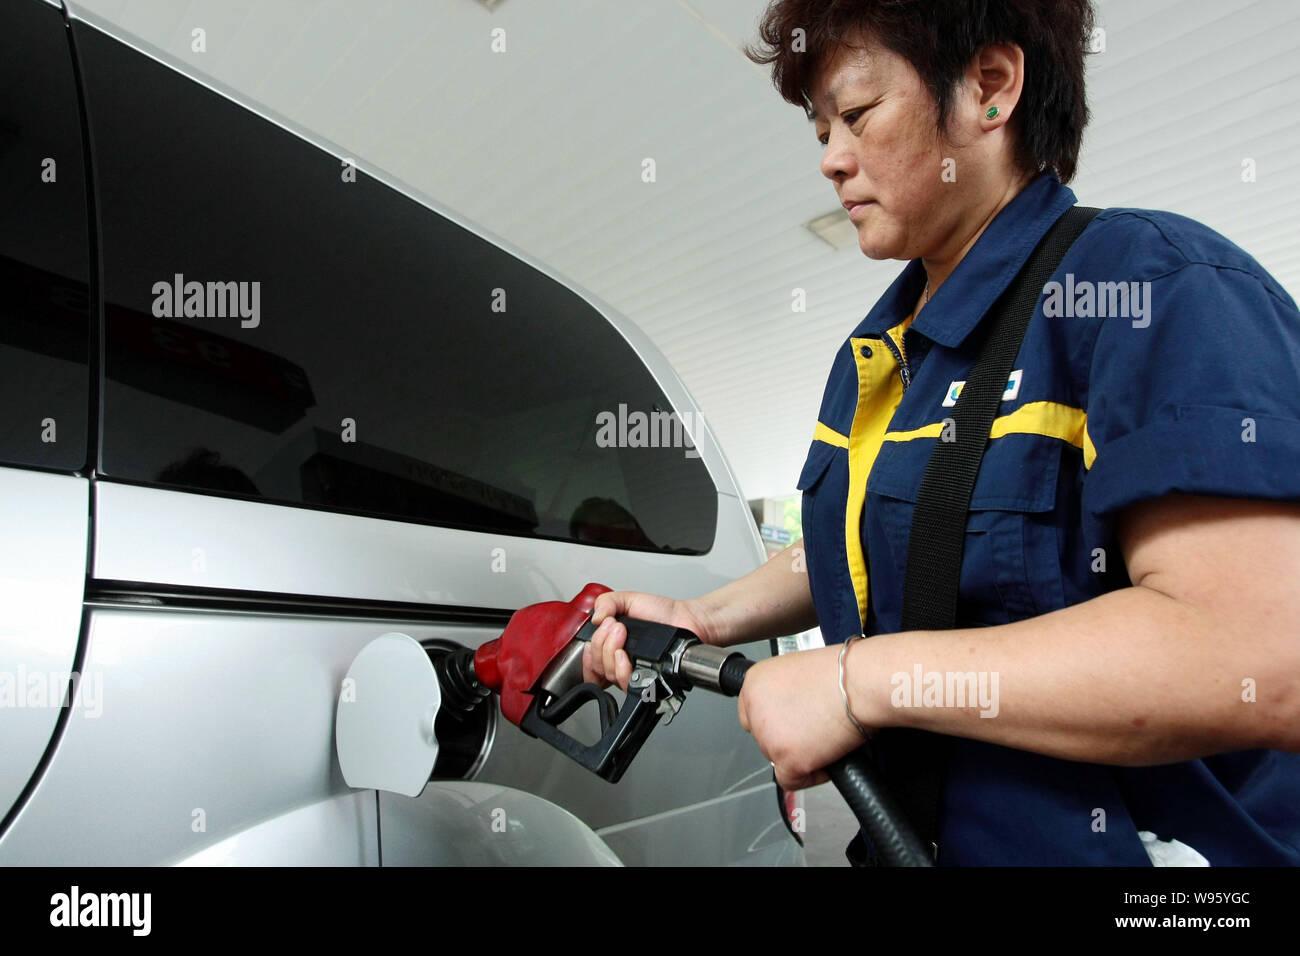 Chinese Petrol Station Stock Photos & Chinese Petrol Station